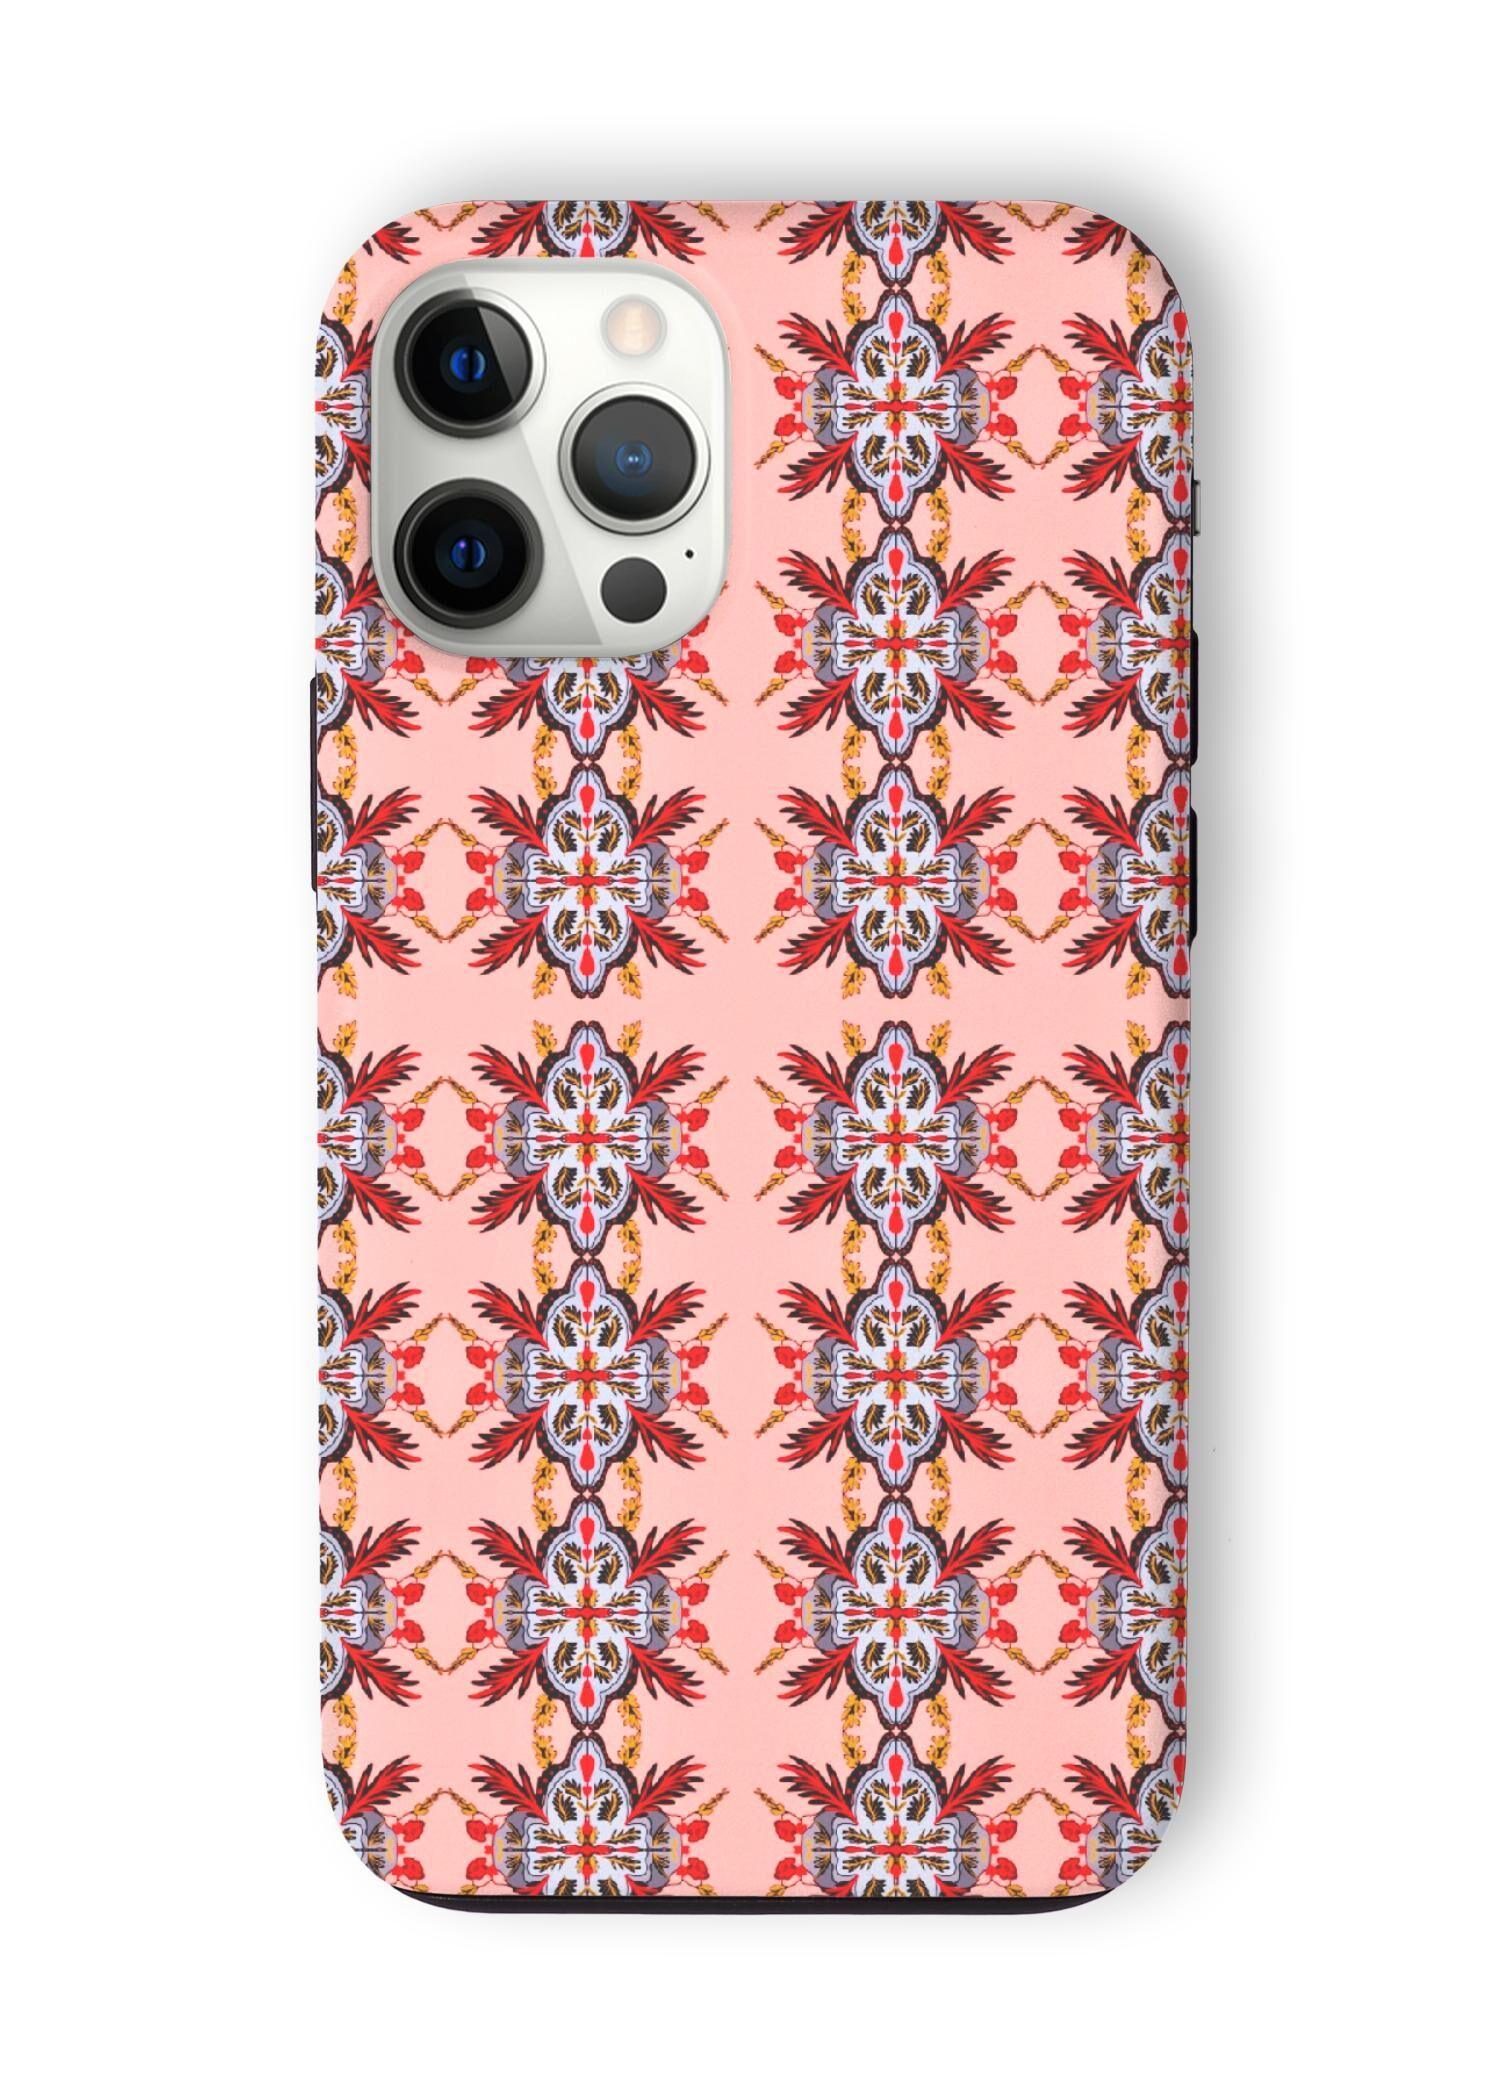 VIDA iPhone Case - Old Fashion by VIDA Original Artist  - Size: iPhone 12 Pro Max / Tough